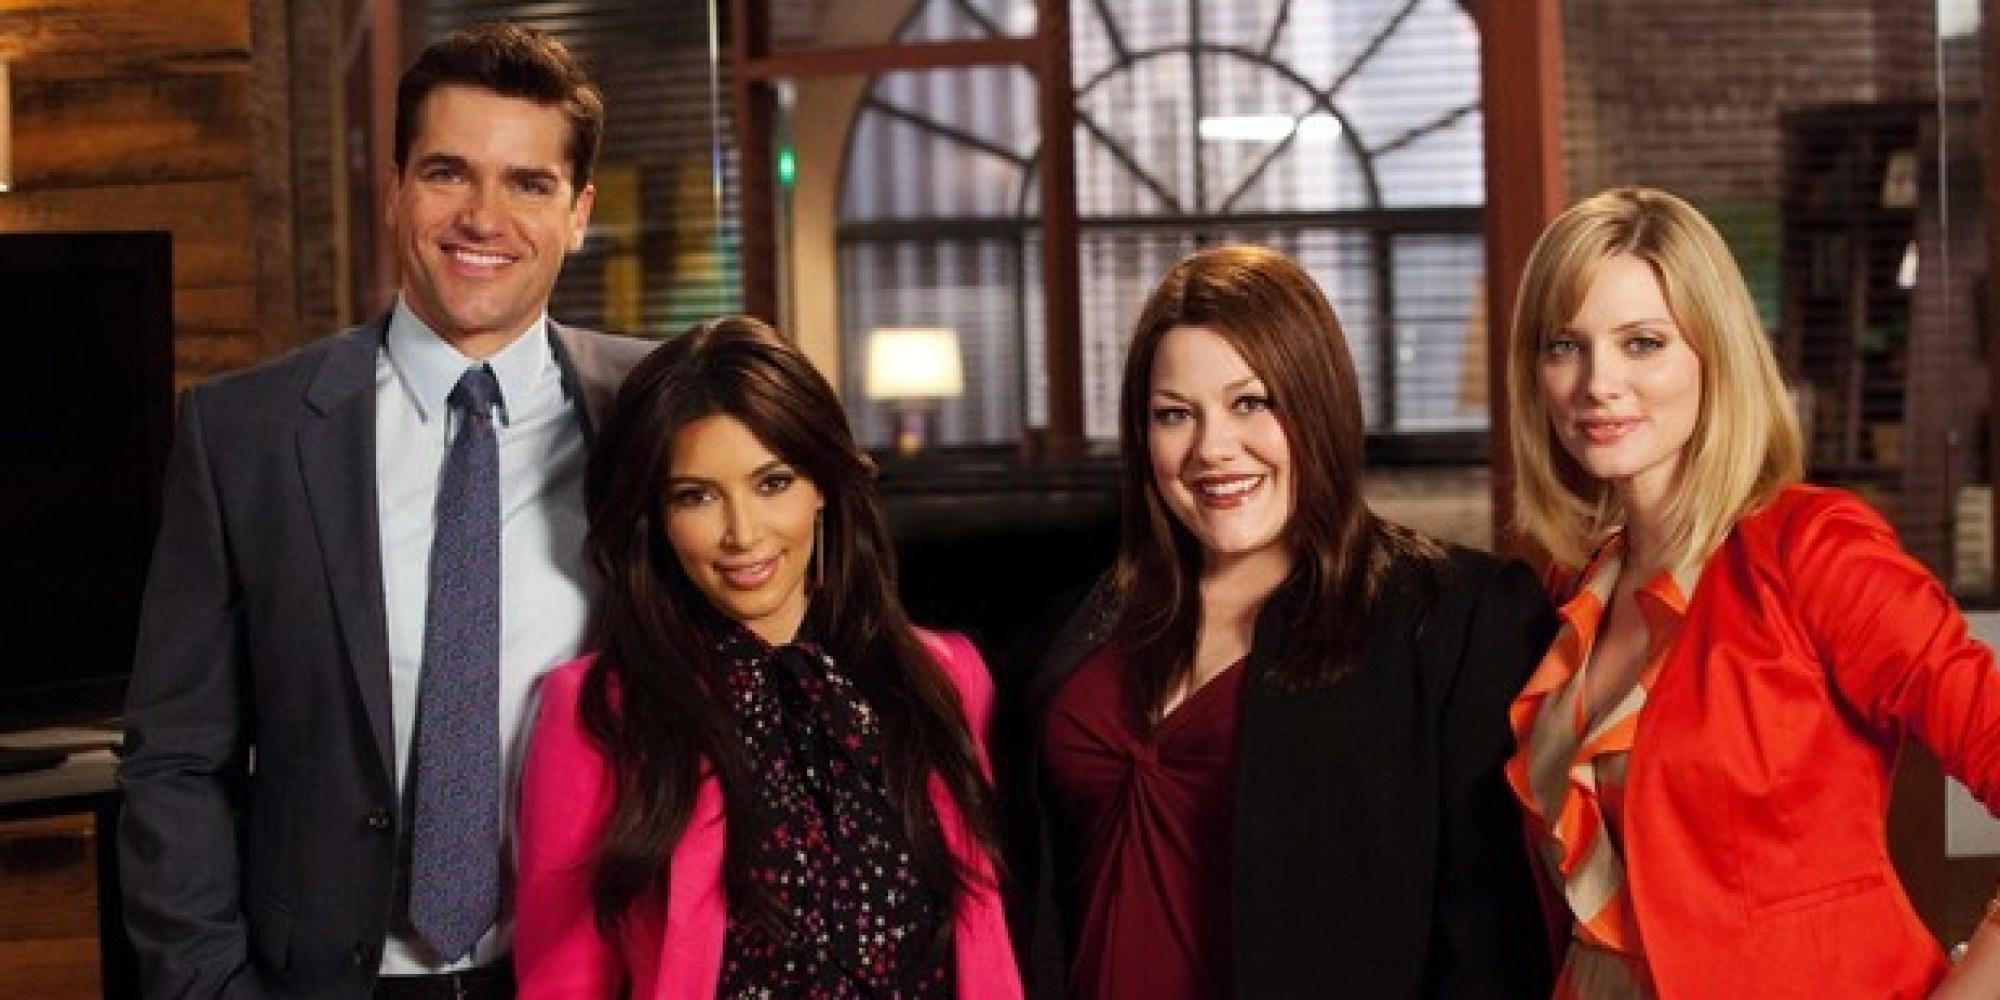 Lifetime 39 s 39 drop dead diva 39 will end after season 6 huffpost - Drop dead diva 6 ...